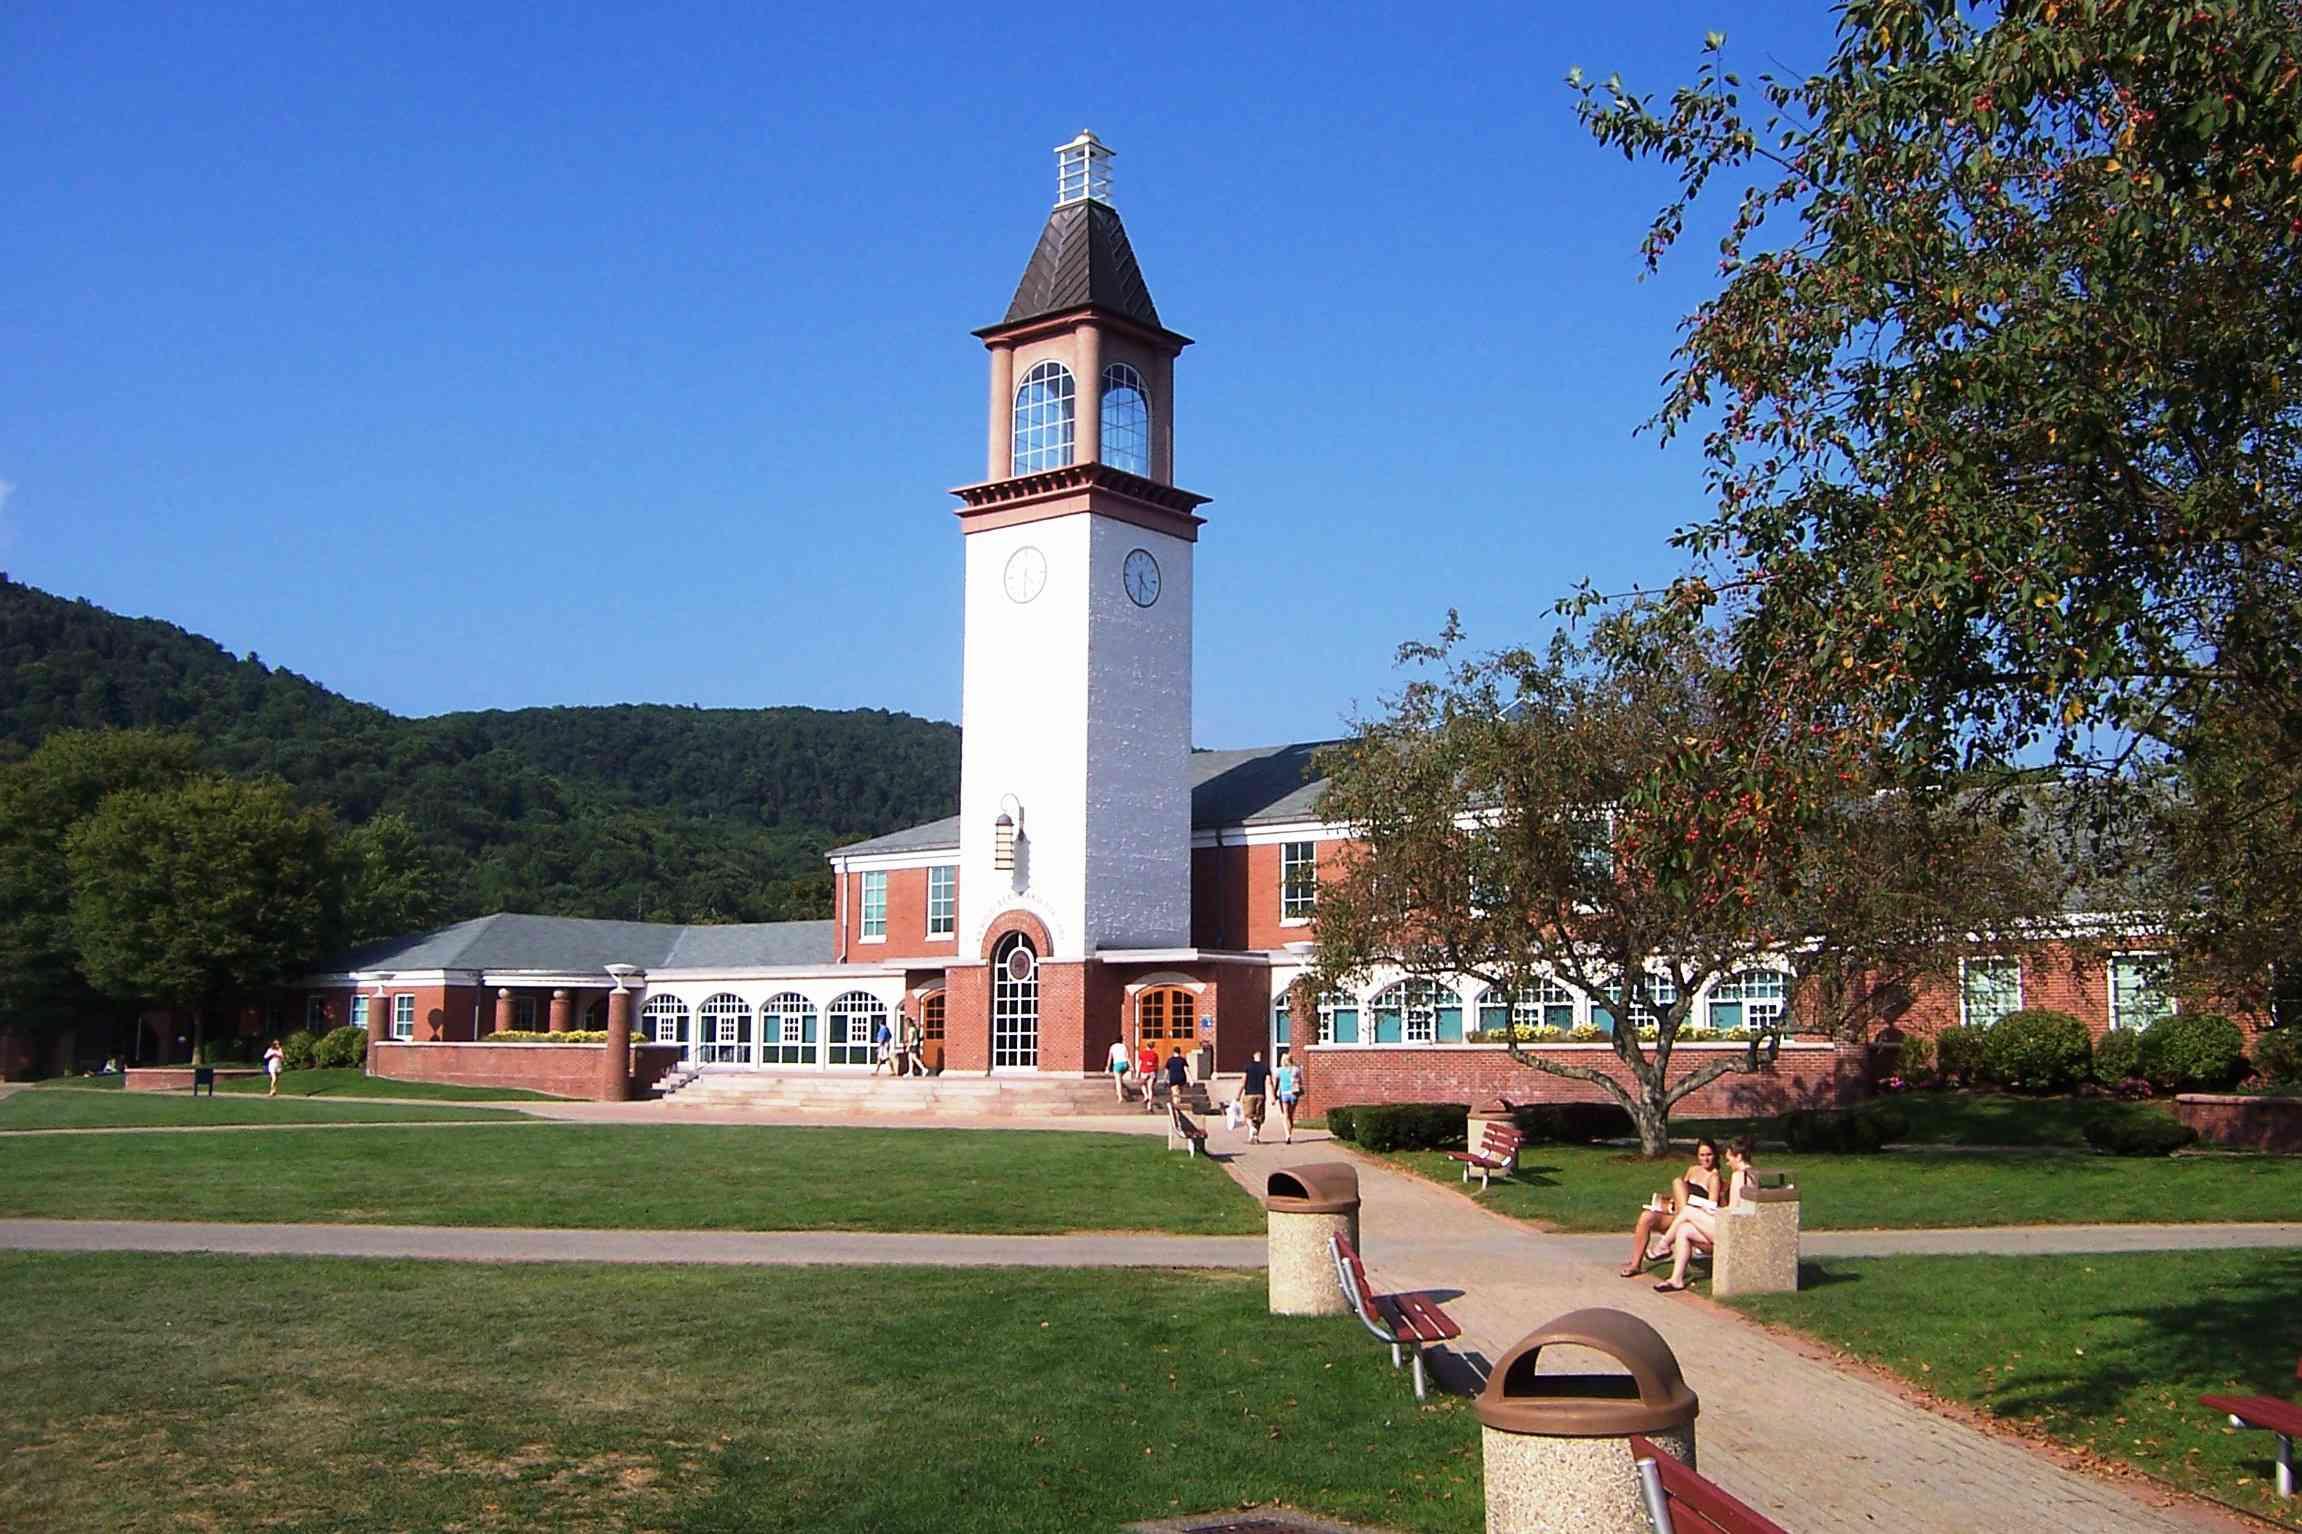 Quinnipiac University Library and Clock Tower